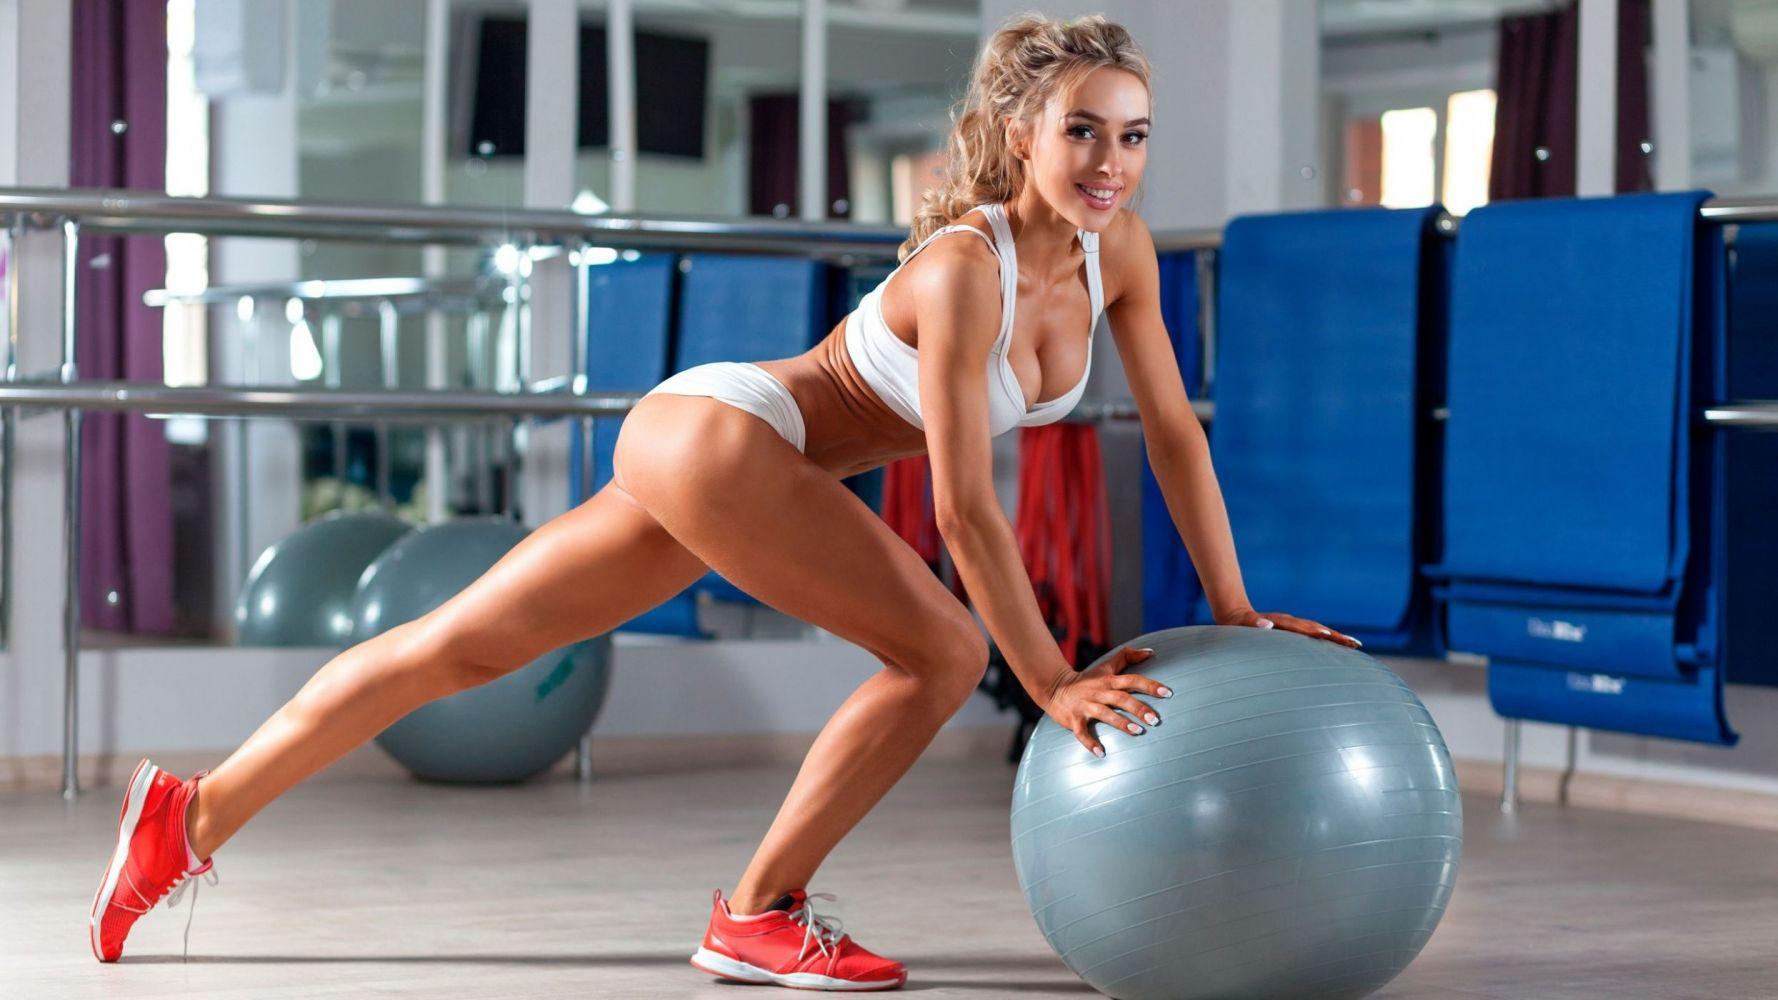 Sexy aerobic women